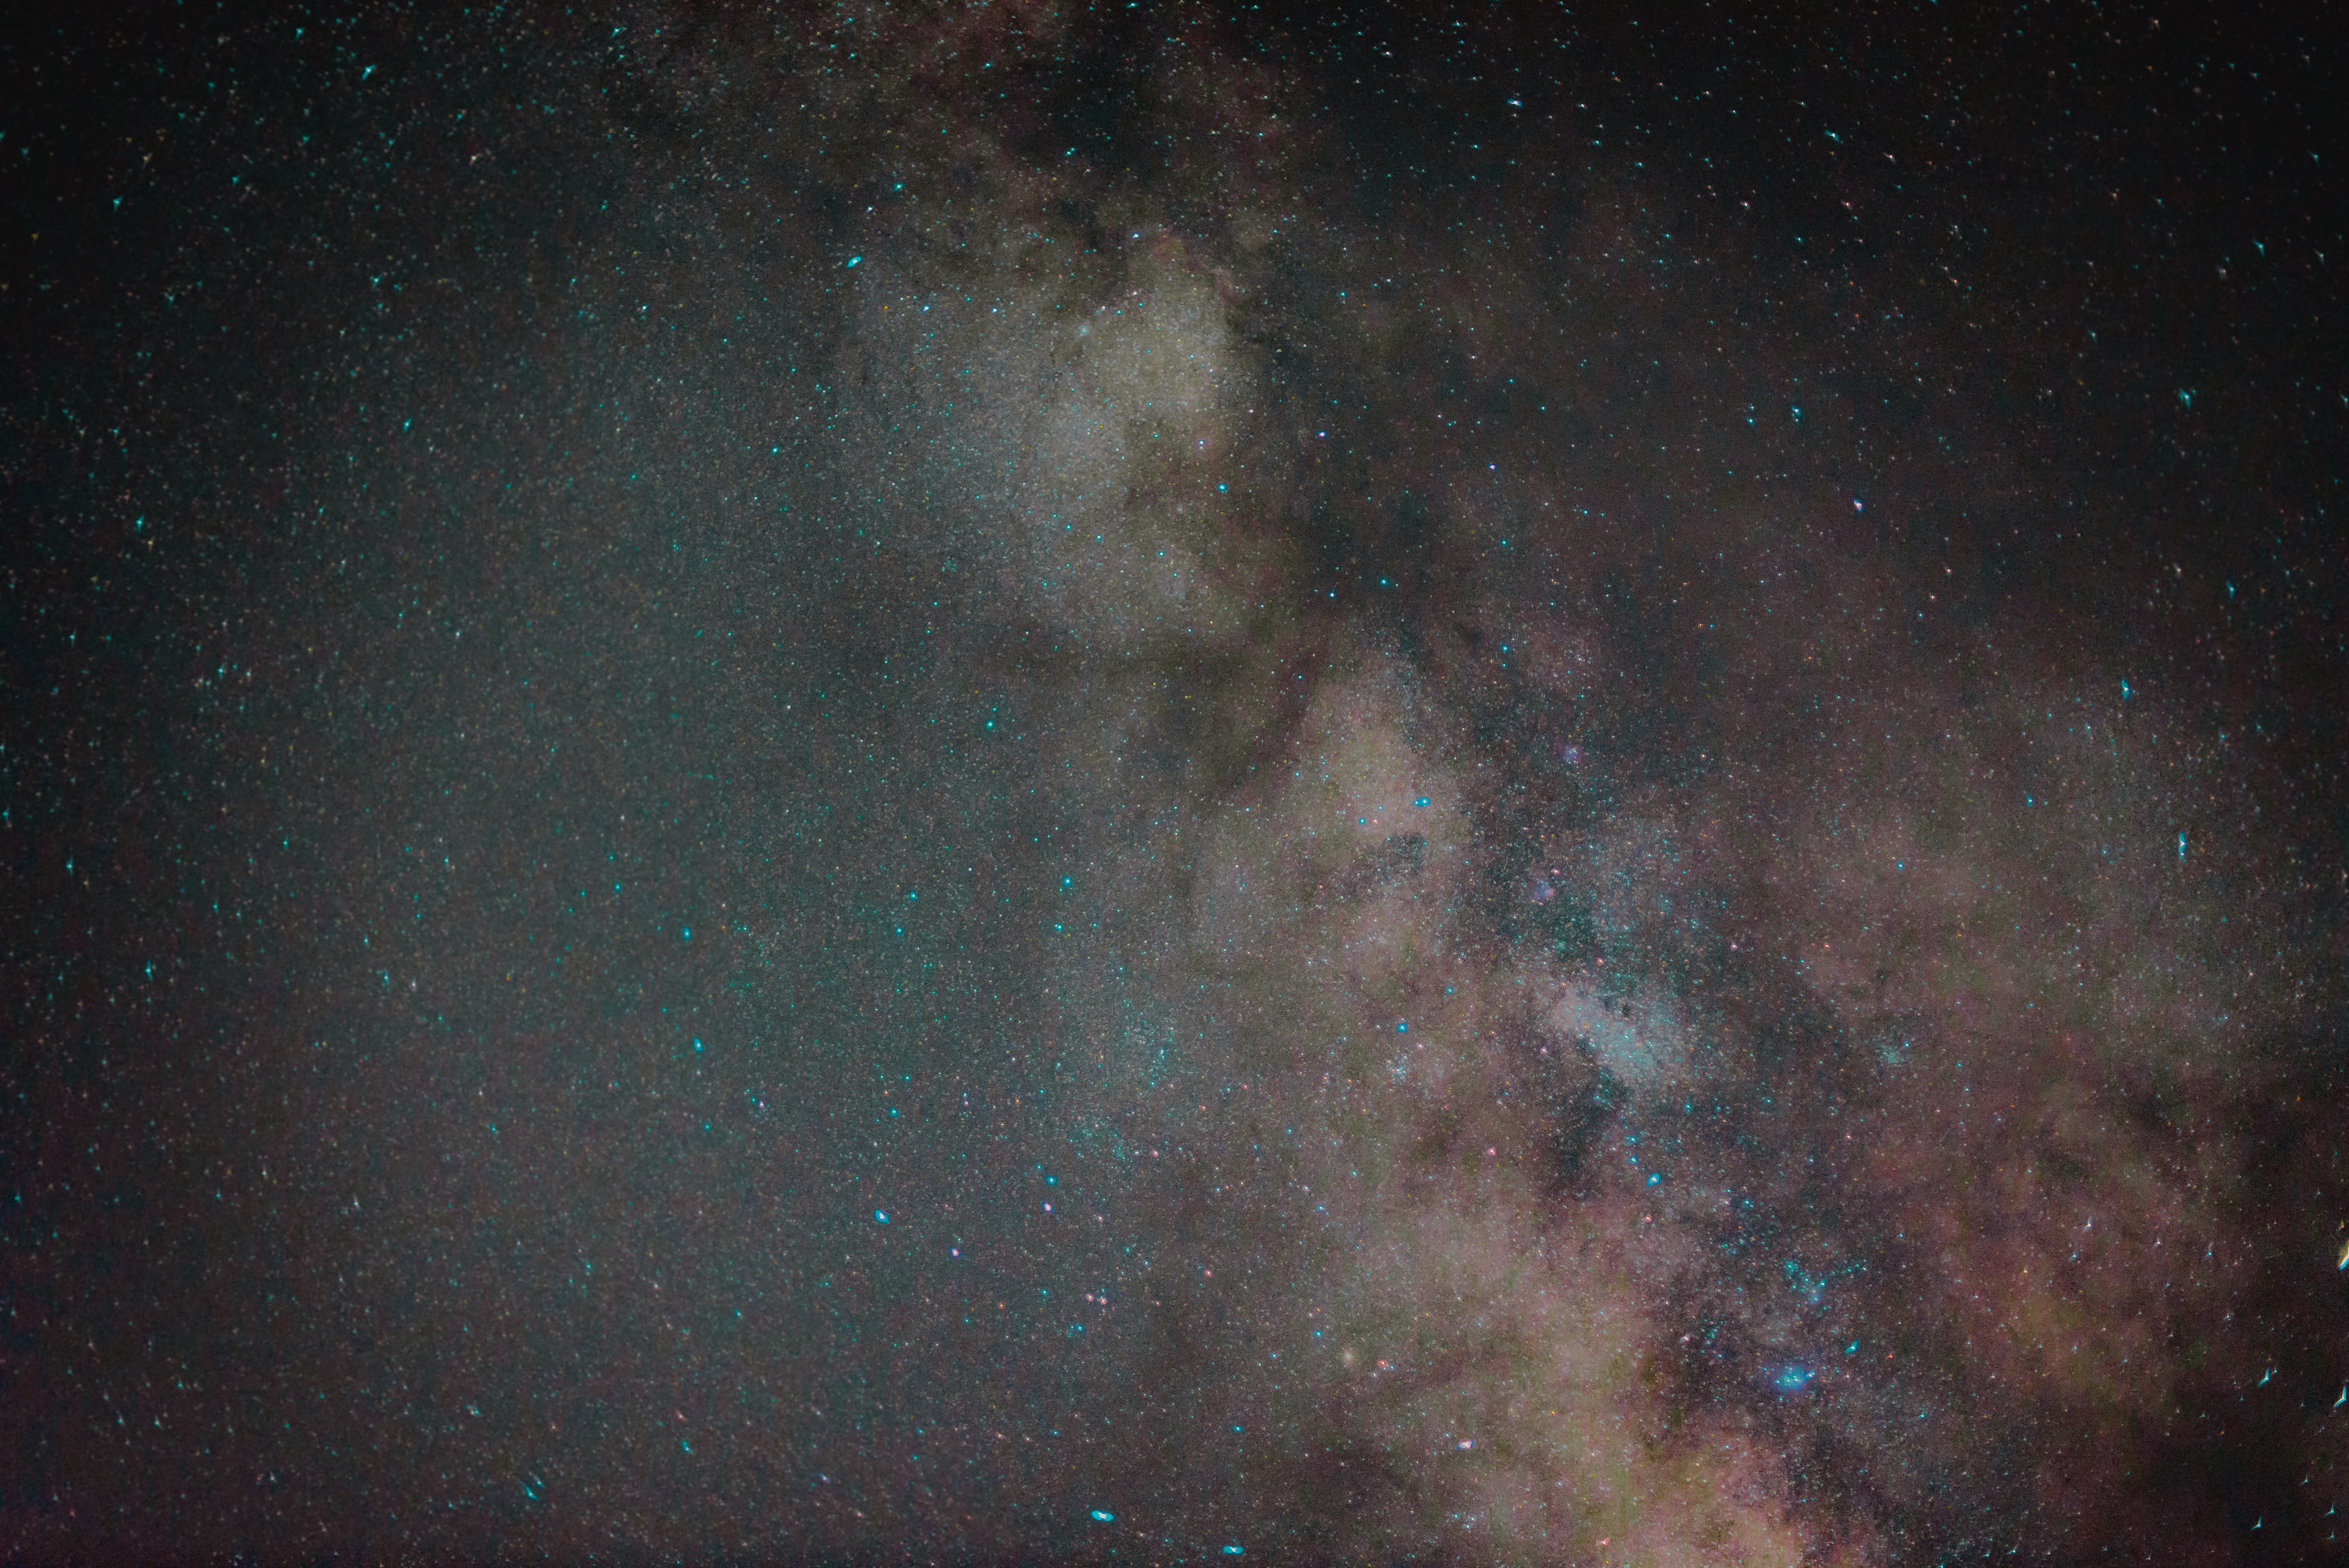 5286772 6016x4016 #light, #stars, #night sky, #night, #PNG.